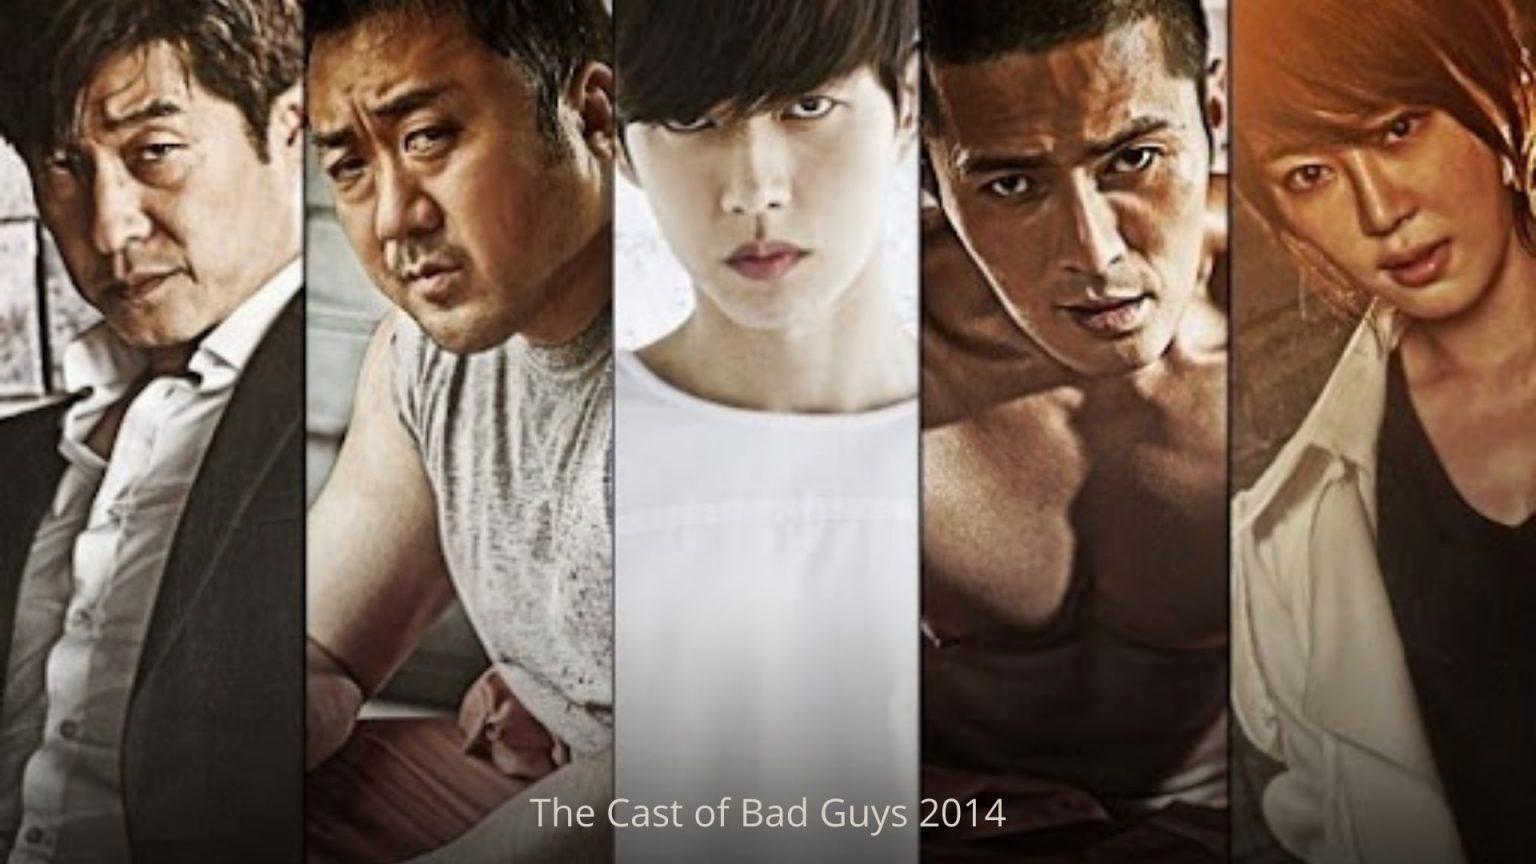 OCN's Bad Guys 2014 k-drama Release Date, Plot, Watch Online